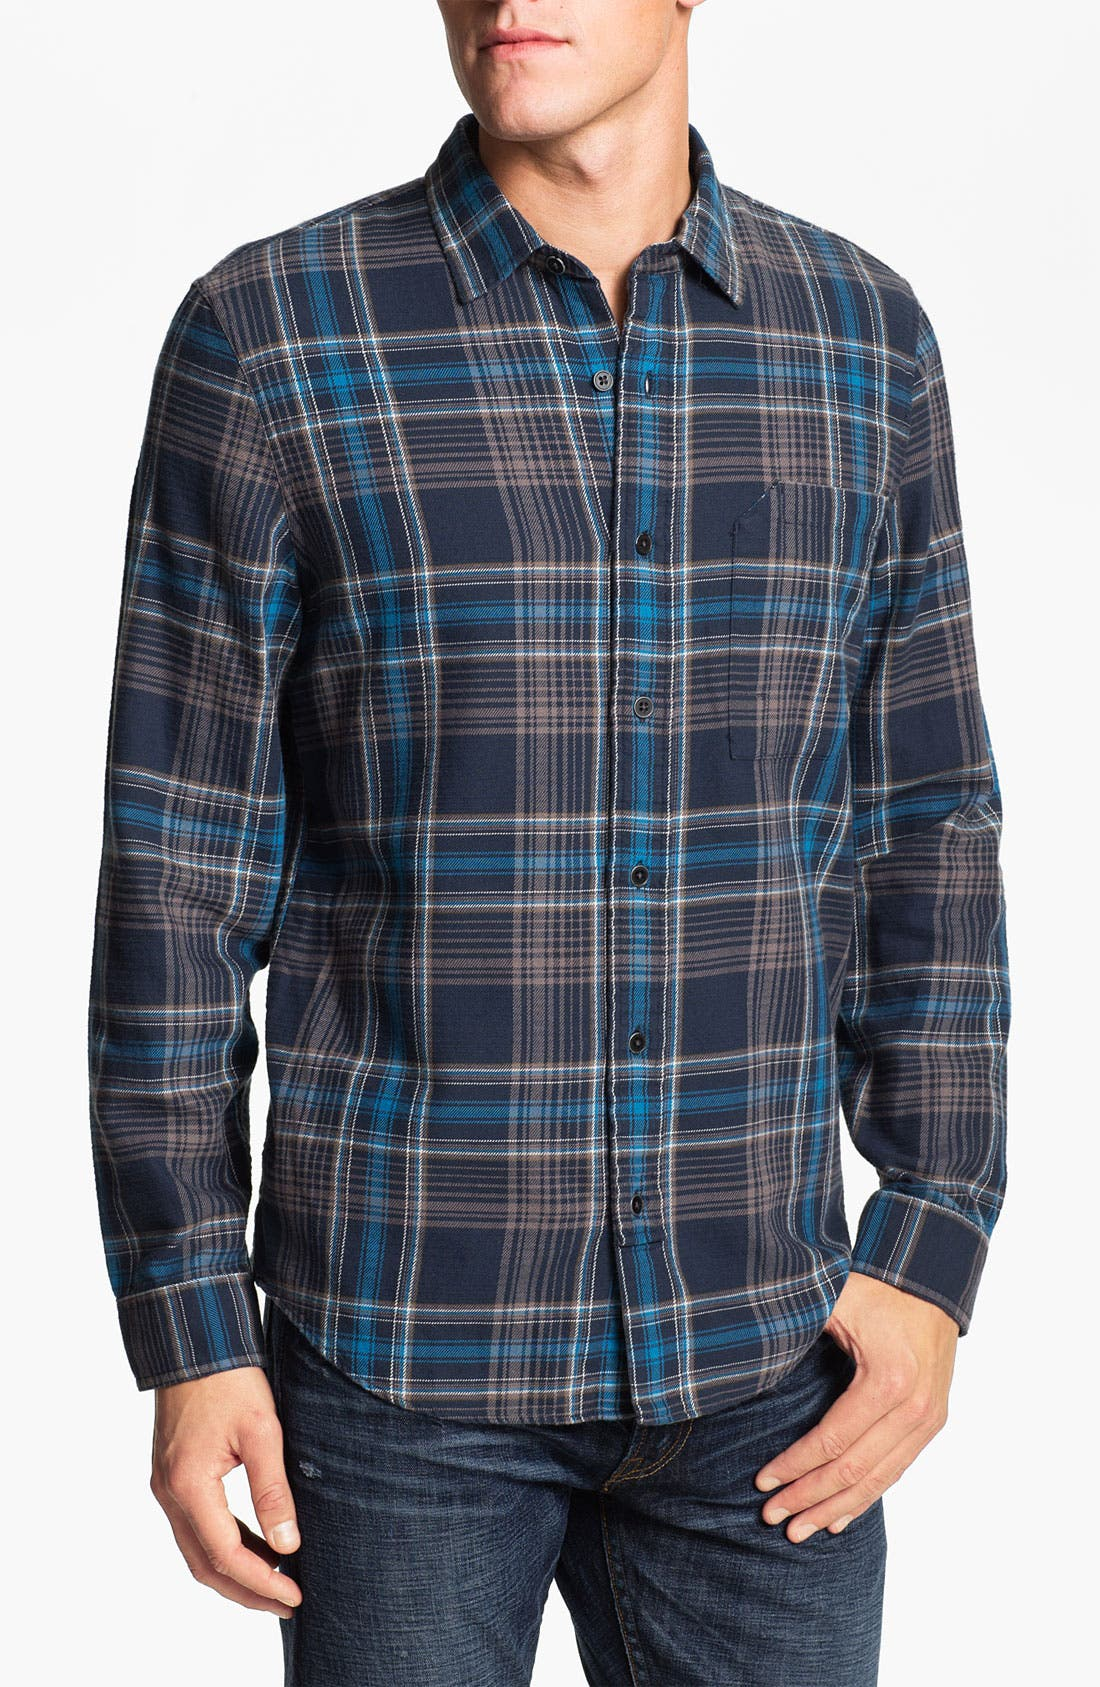 Alternate Image 1 Selected - R44 Rogan Standard Issue Flannel Work Shirt